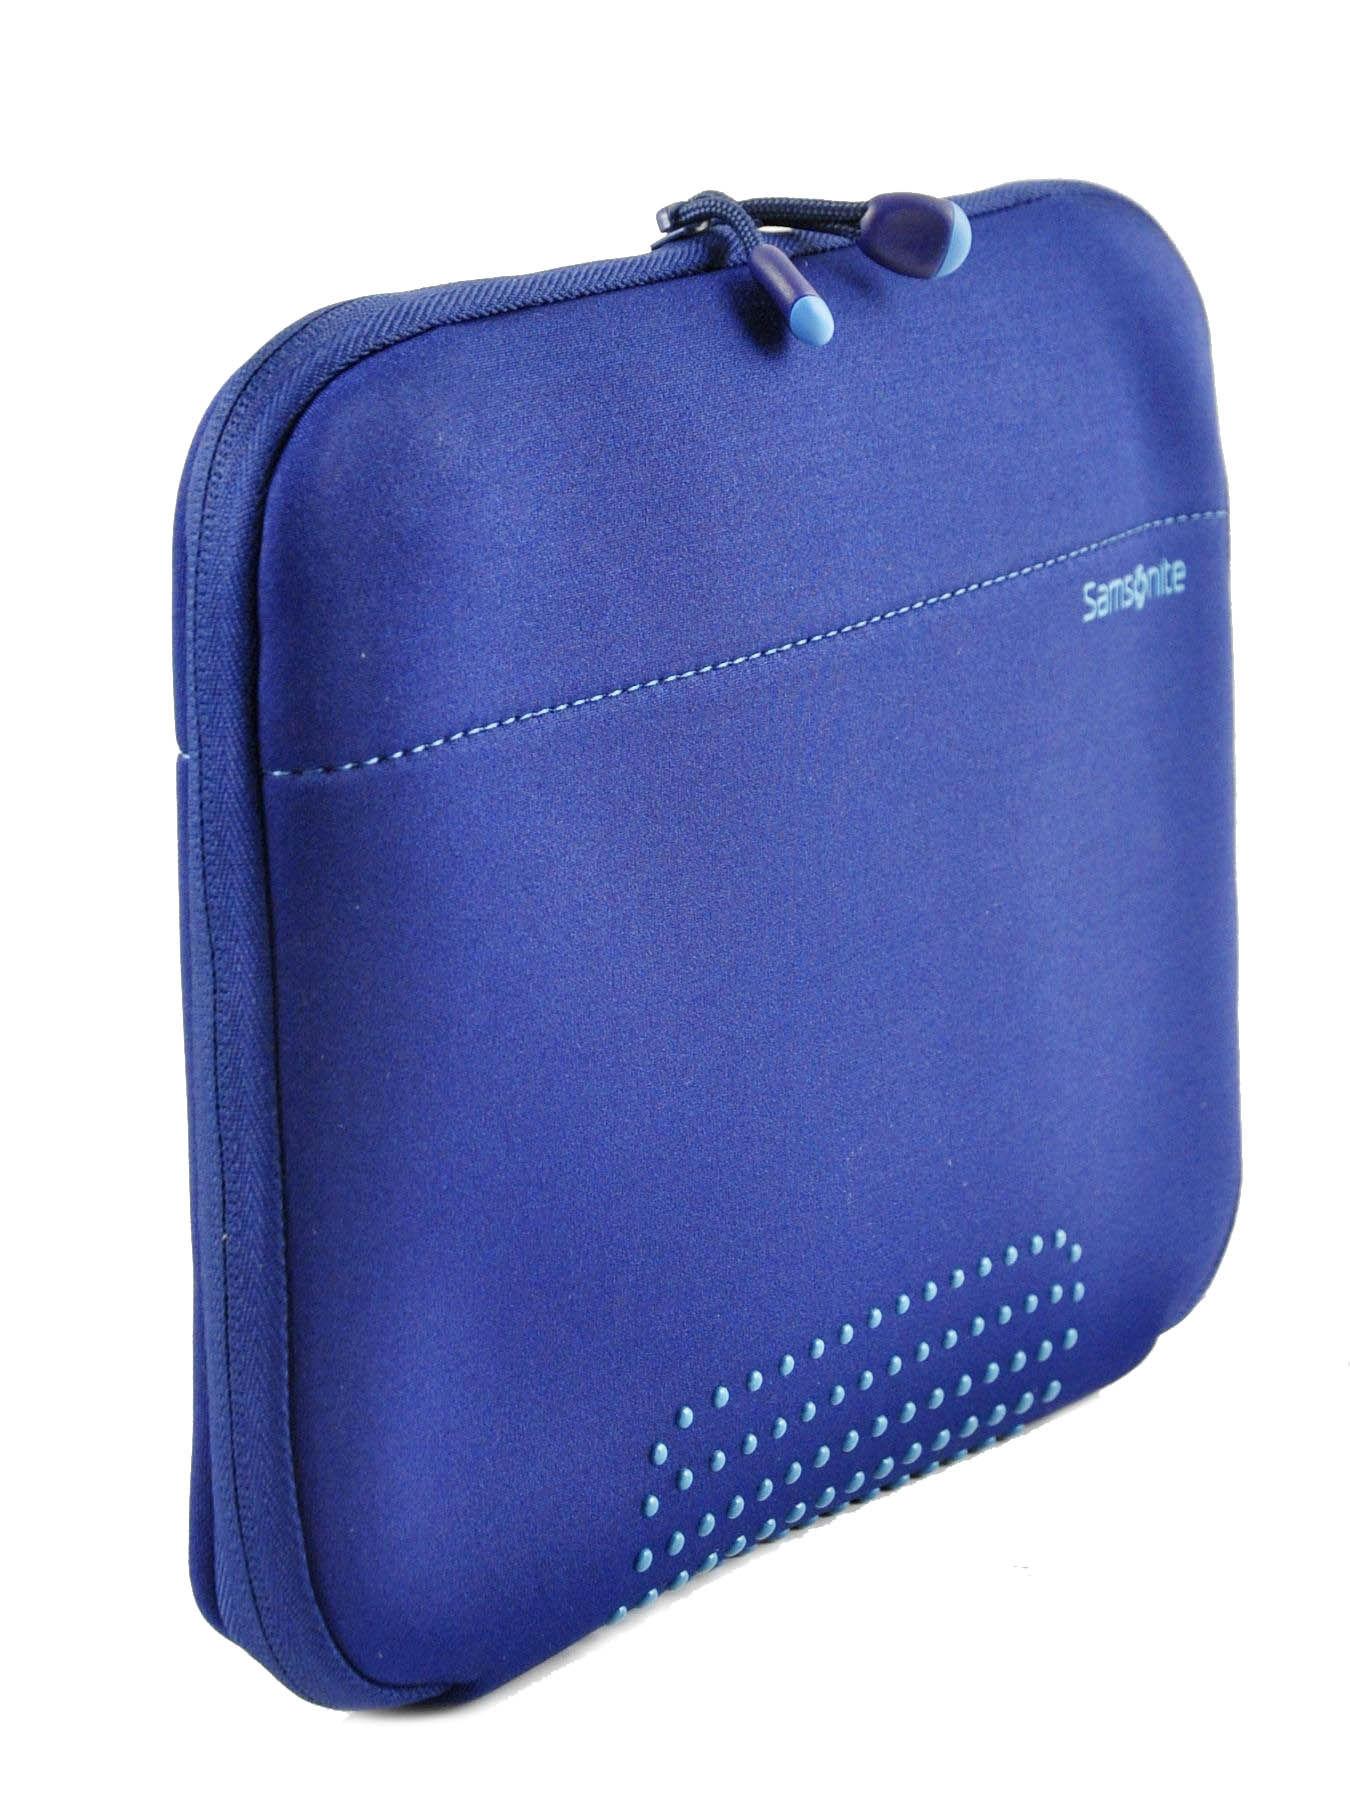 45331c091af Samsonite Laptop cover 41258   V51.011 - free shipping available